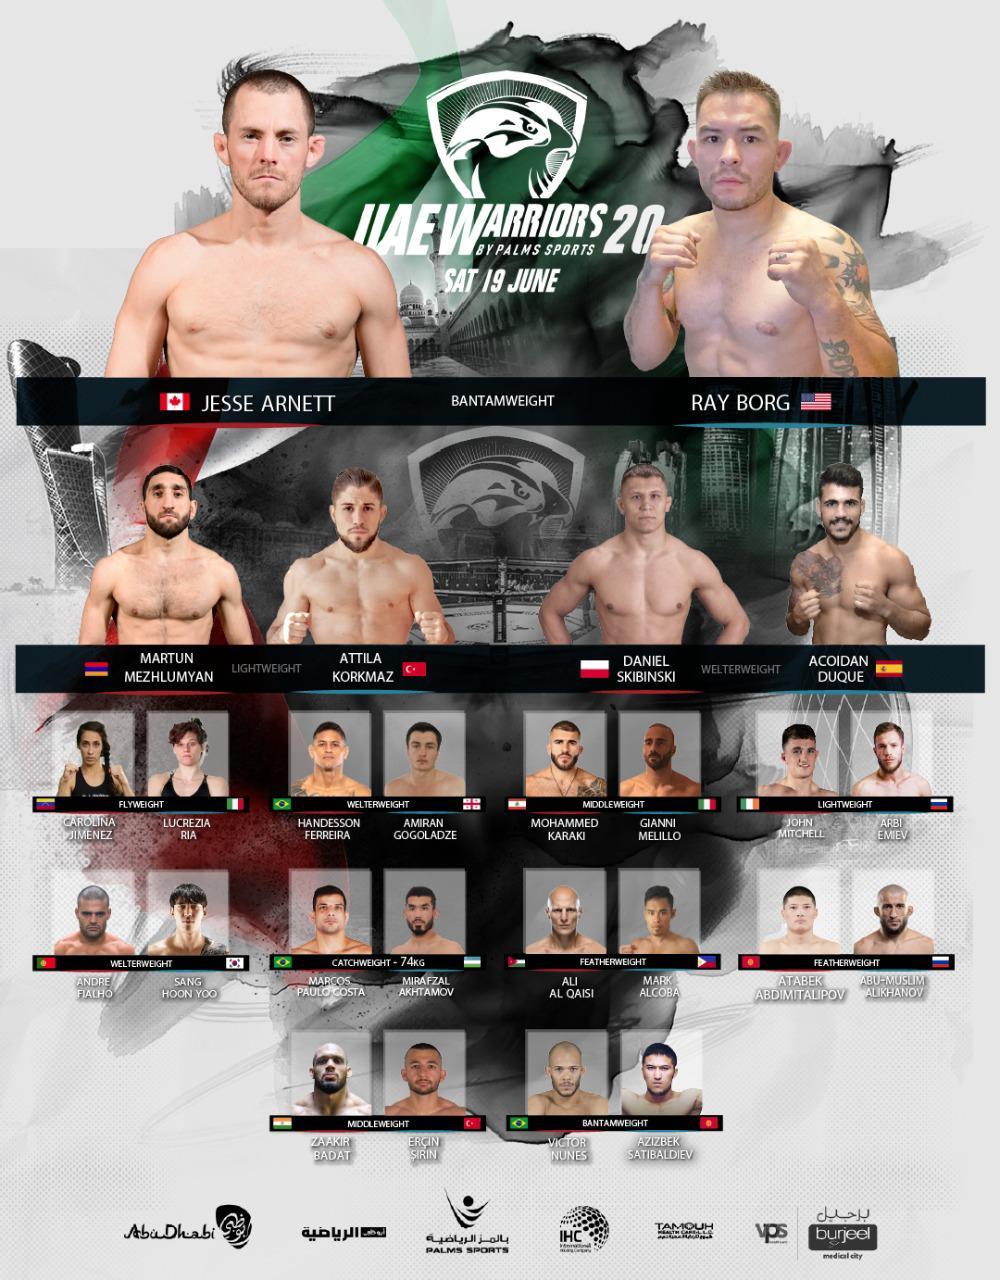 uae warriors 20 fight card